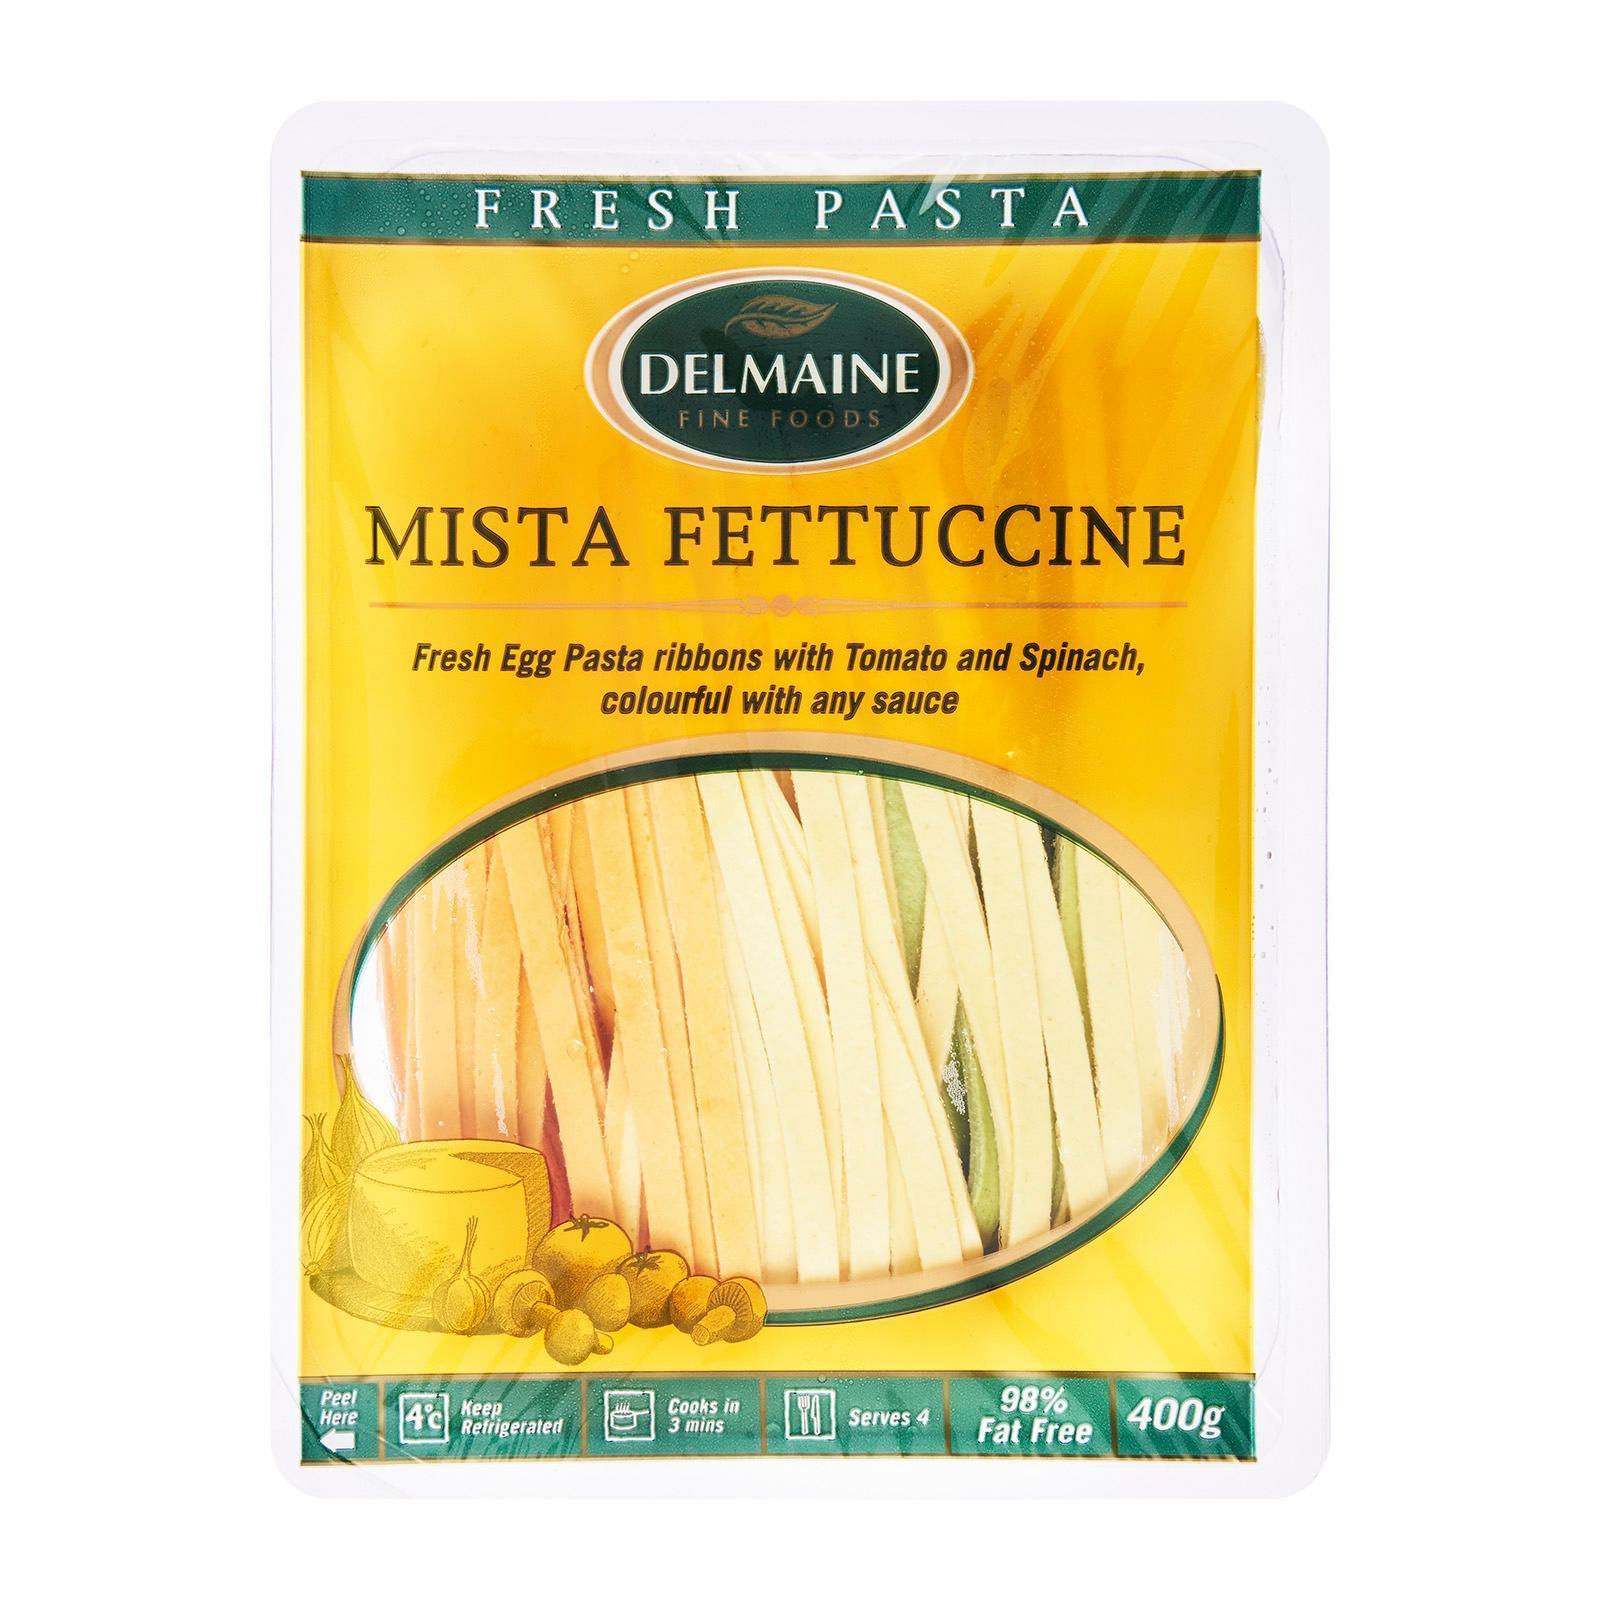 Delmaine Mista Fettuccine Flat Pasta By Redmart.